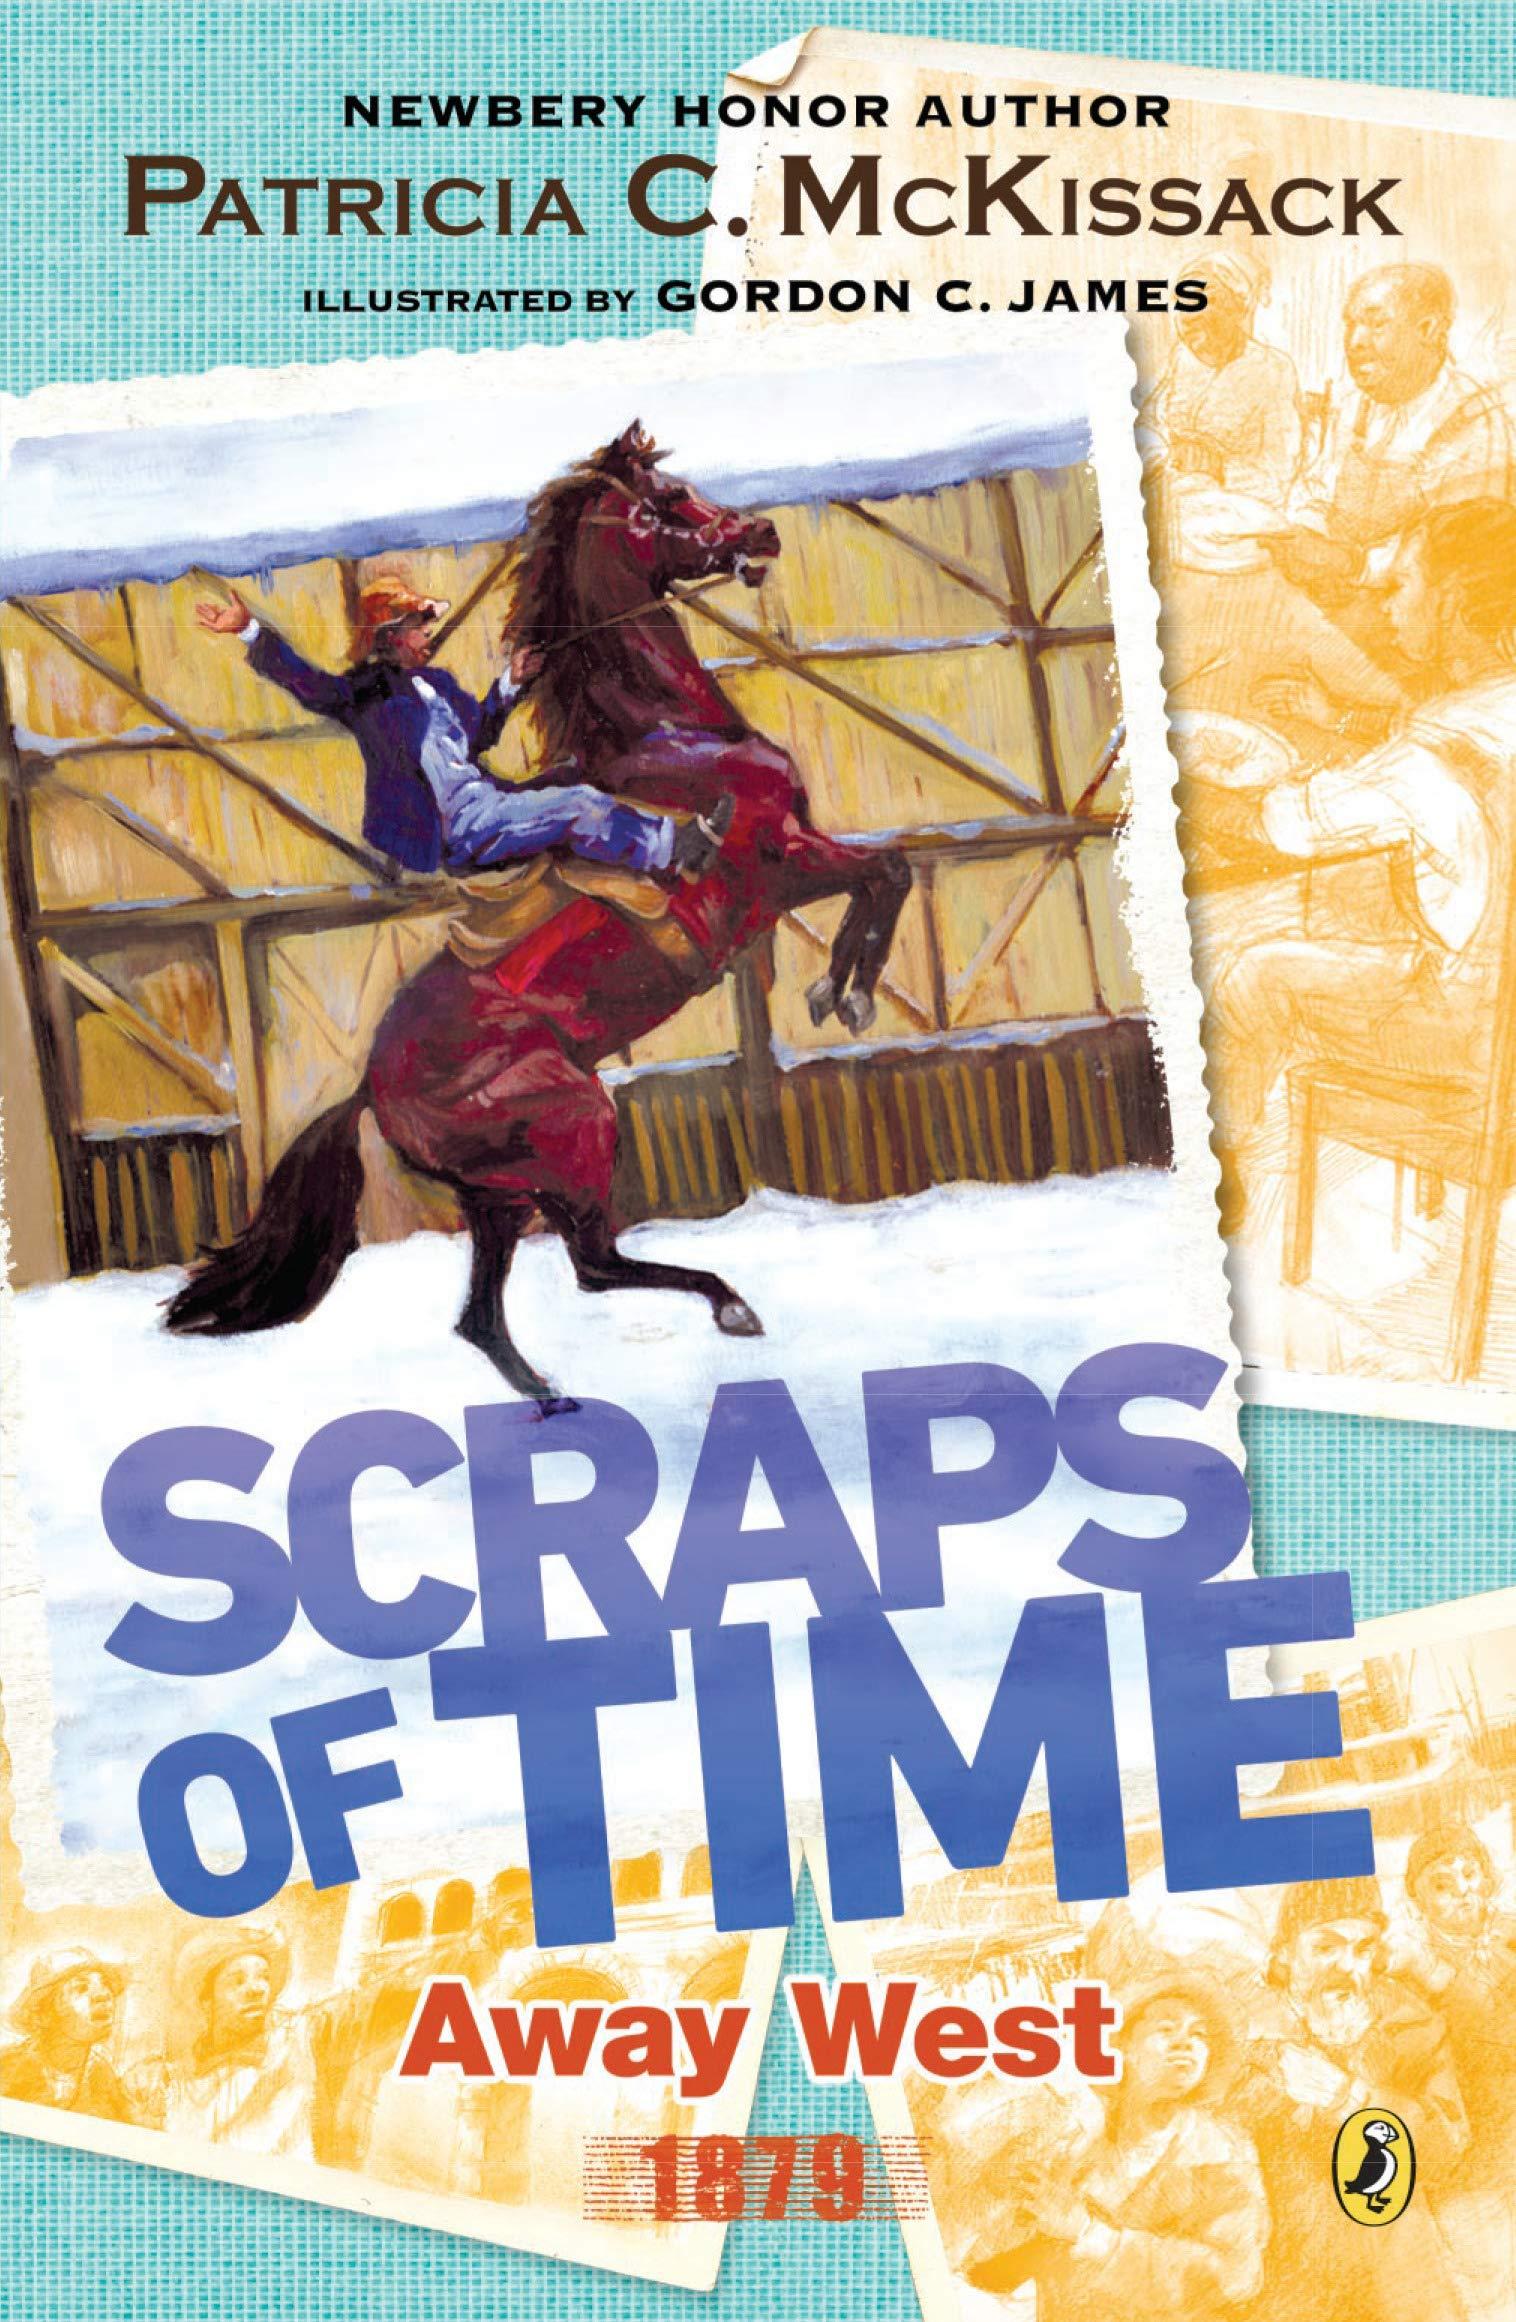 Download Away West (Scraps of Time) PDF ePub book